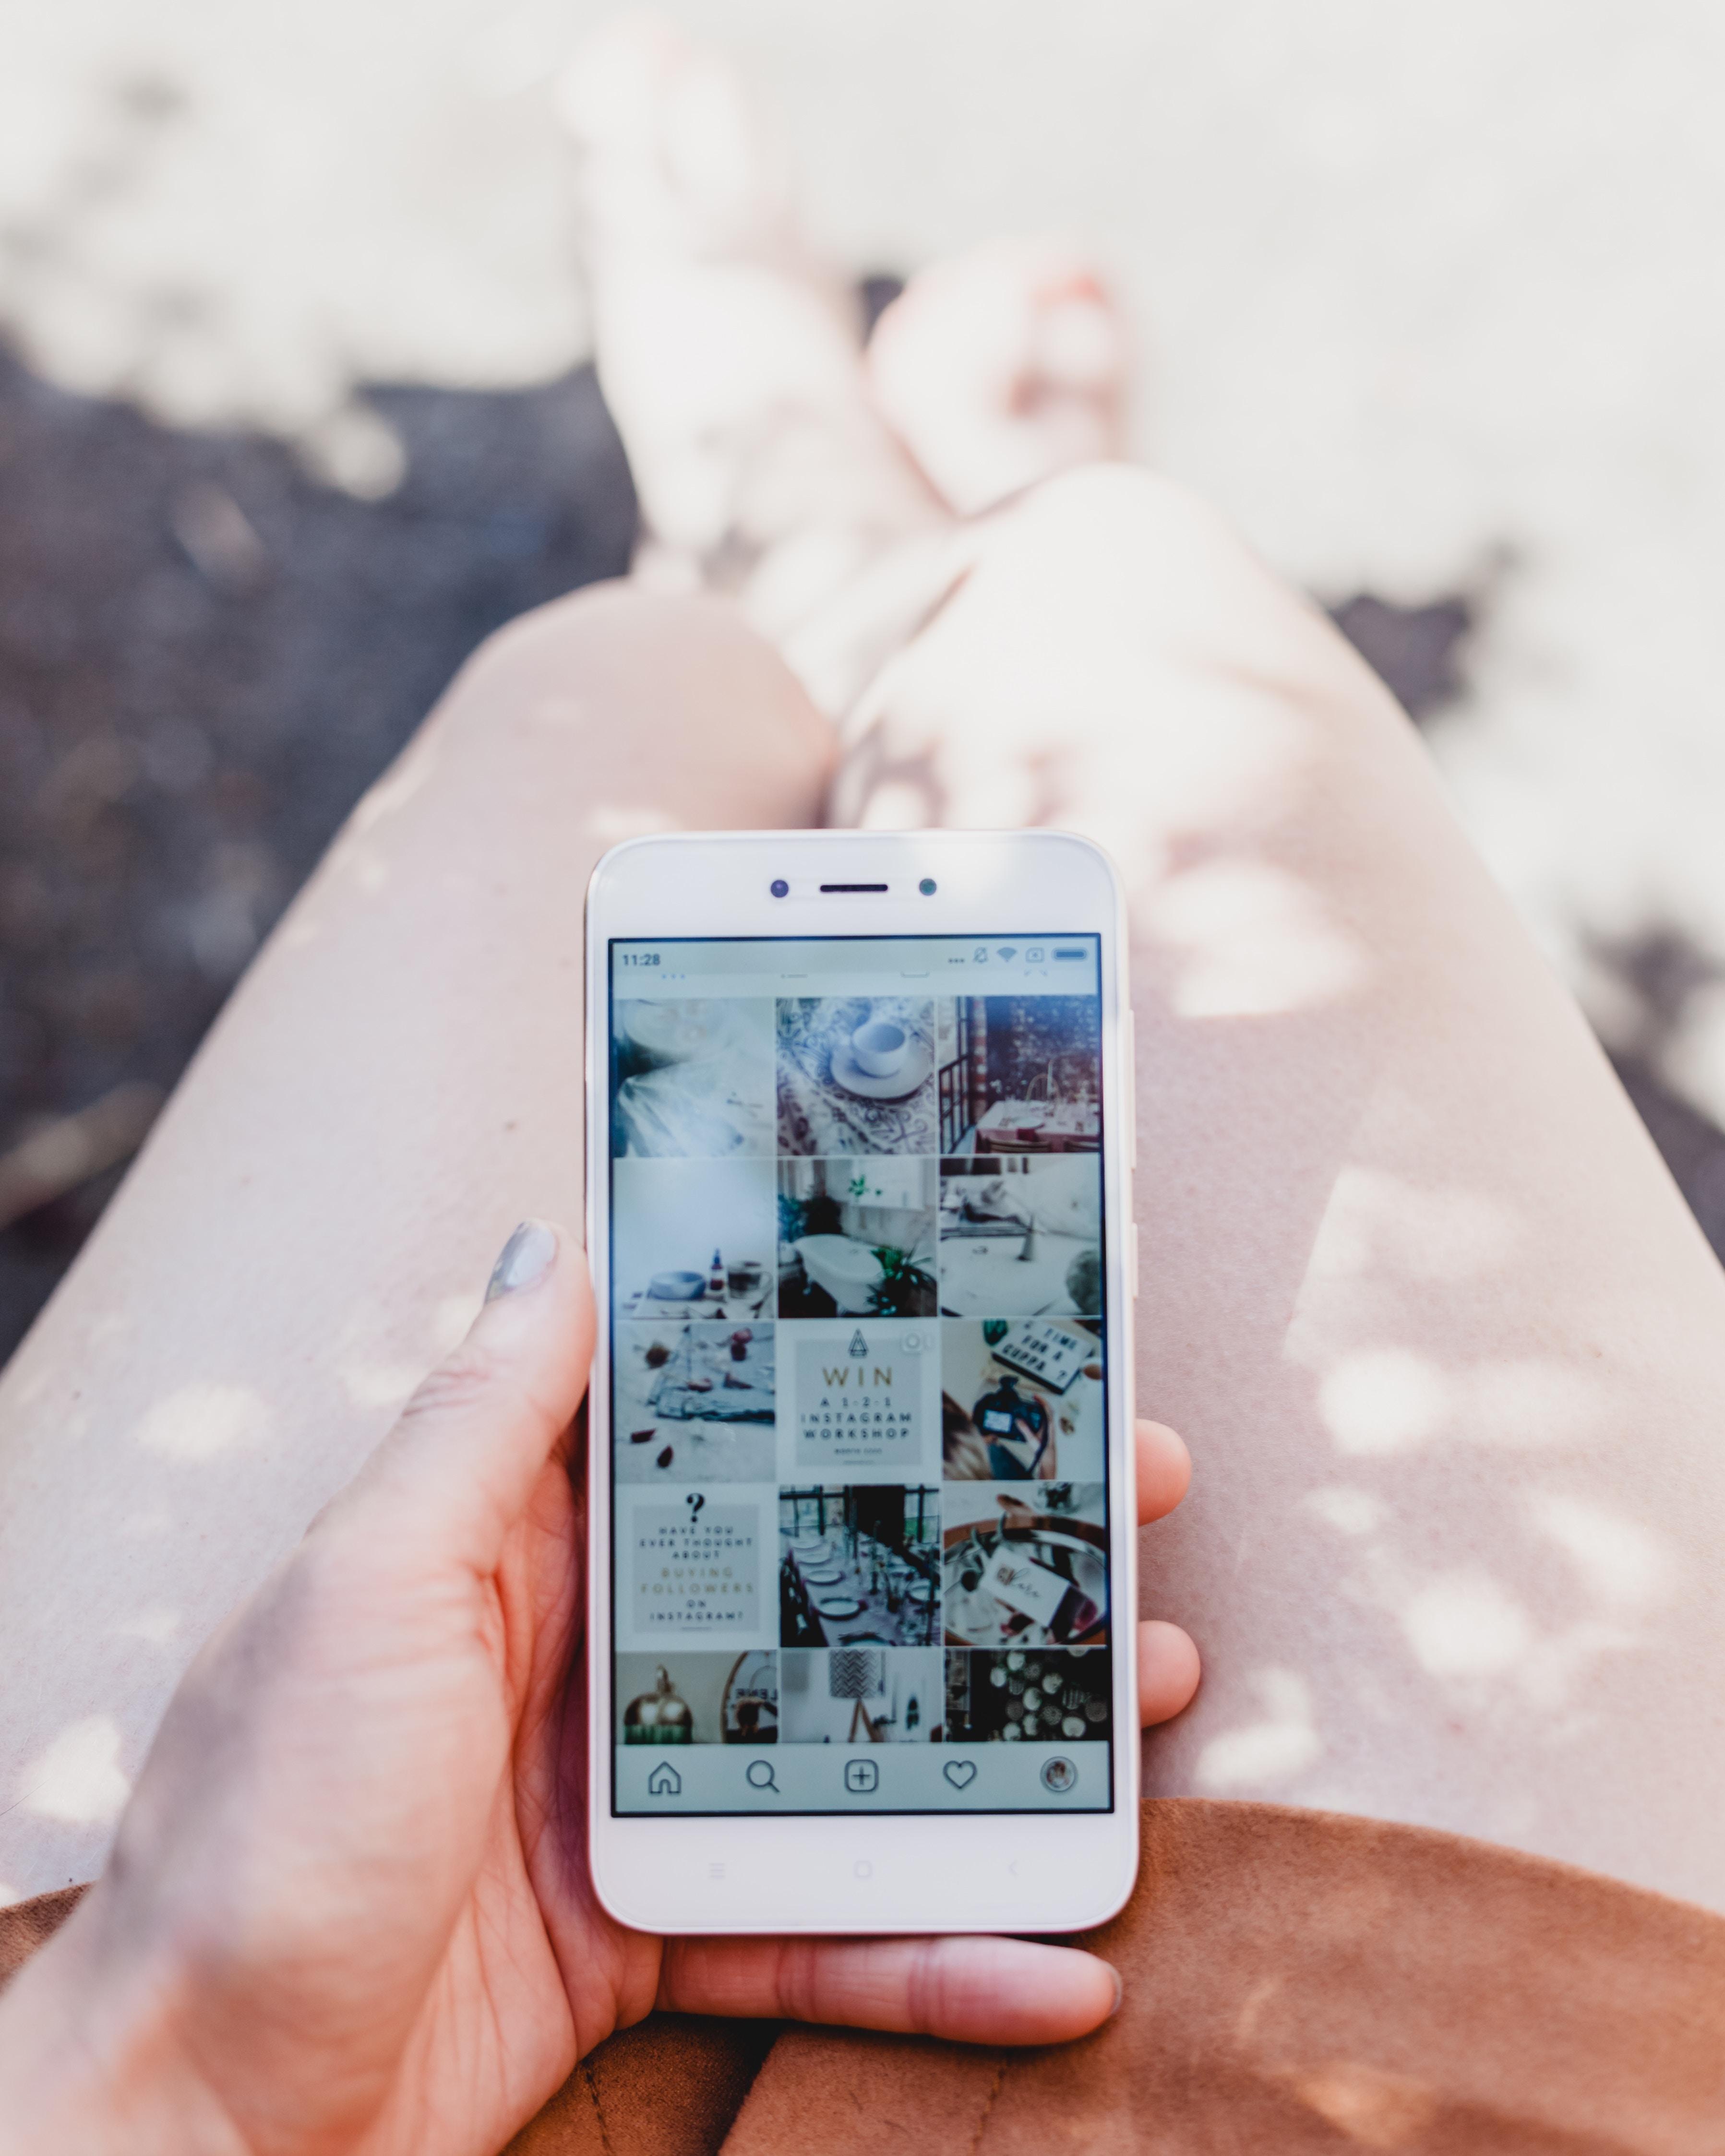 Instagram bird's eye feed